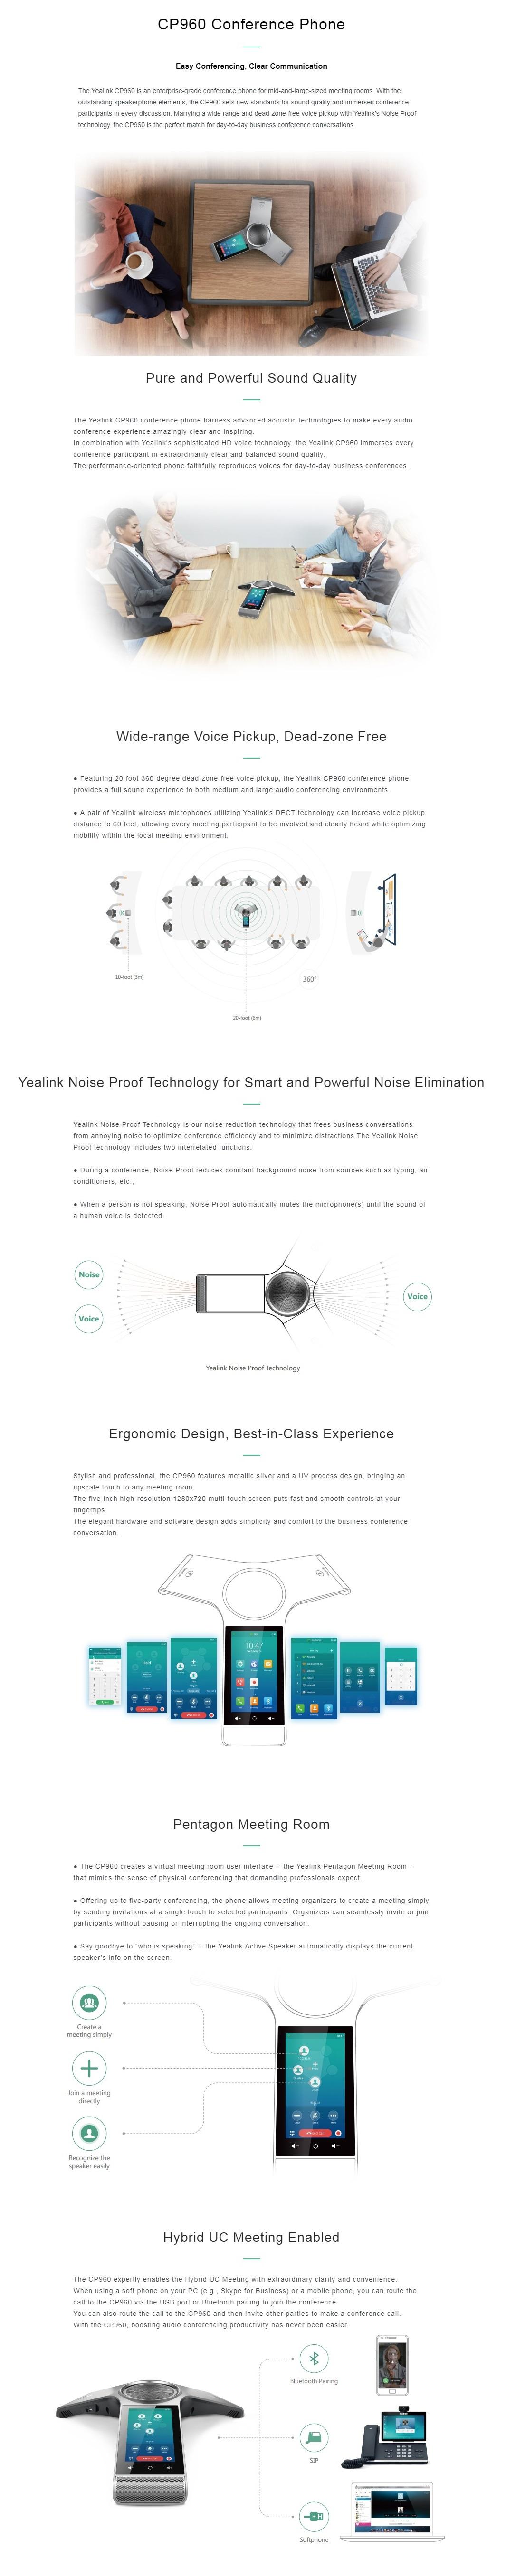 Yealink CP960 Optima HD IP Conference Phone Optima HD Voice, Full Duplex W/O PSU